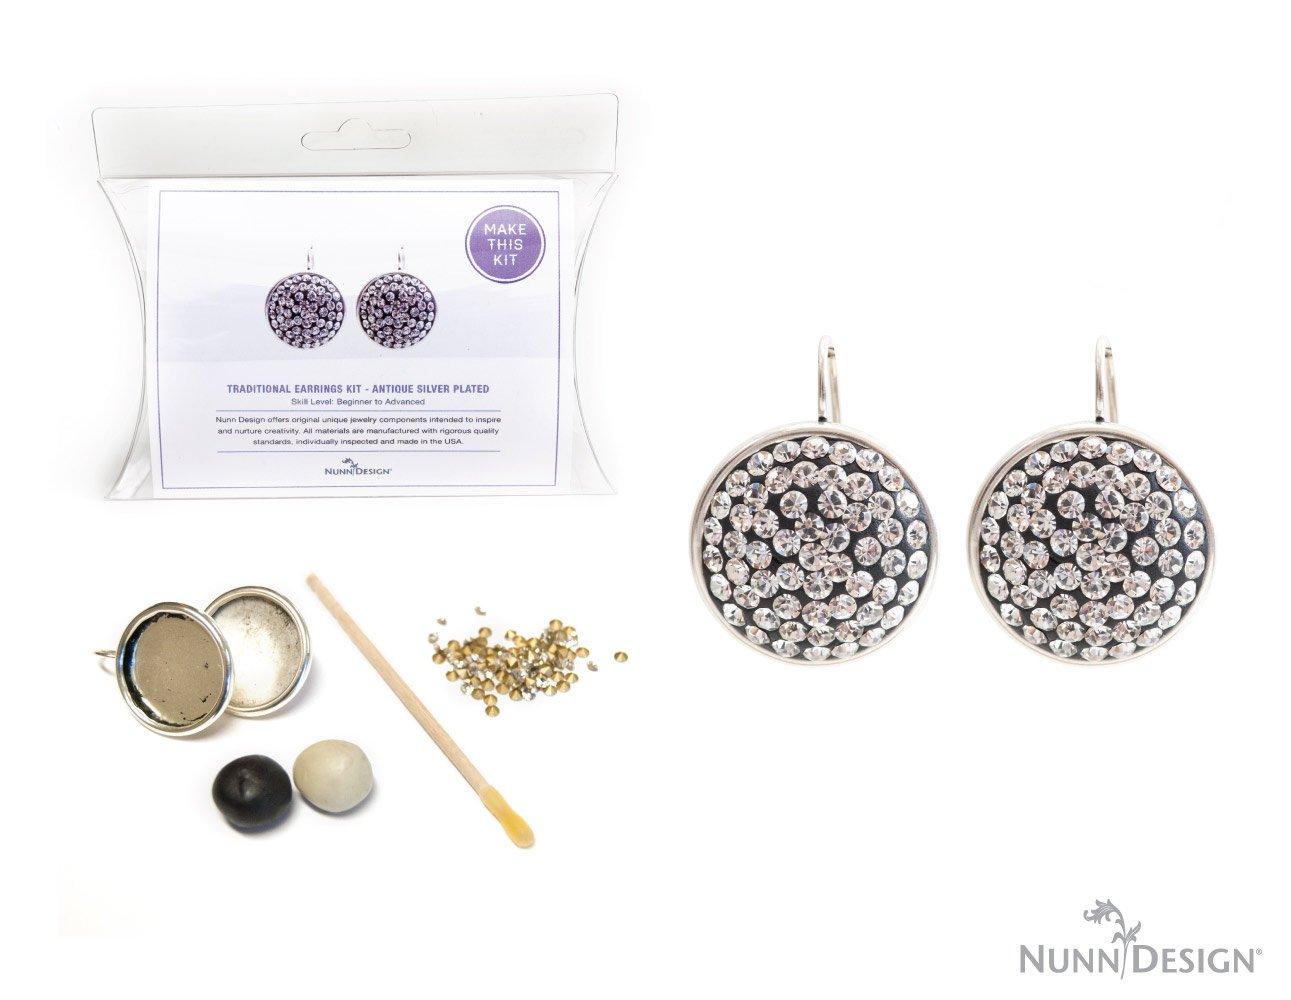 Traditional Earrings Kit